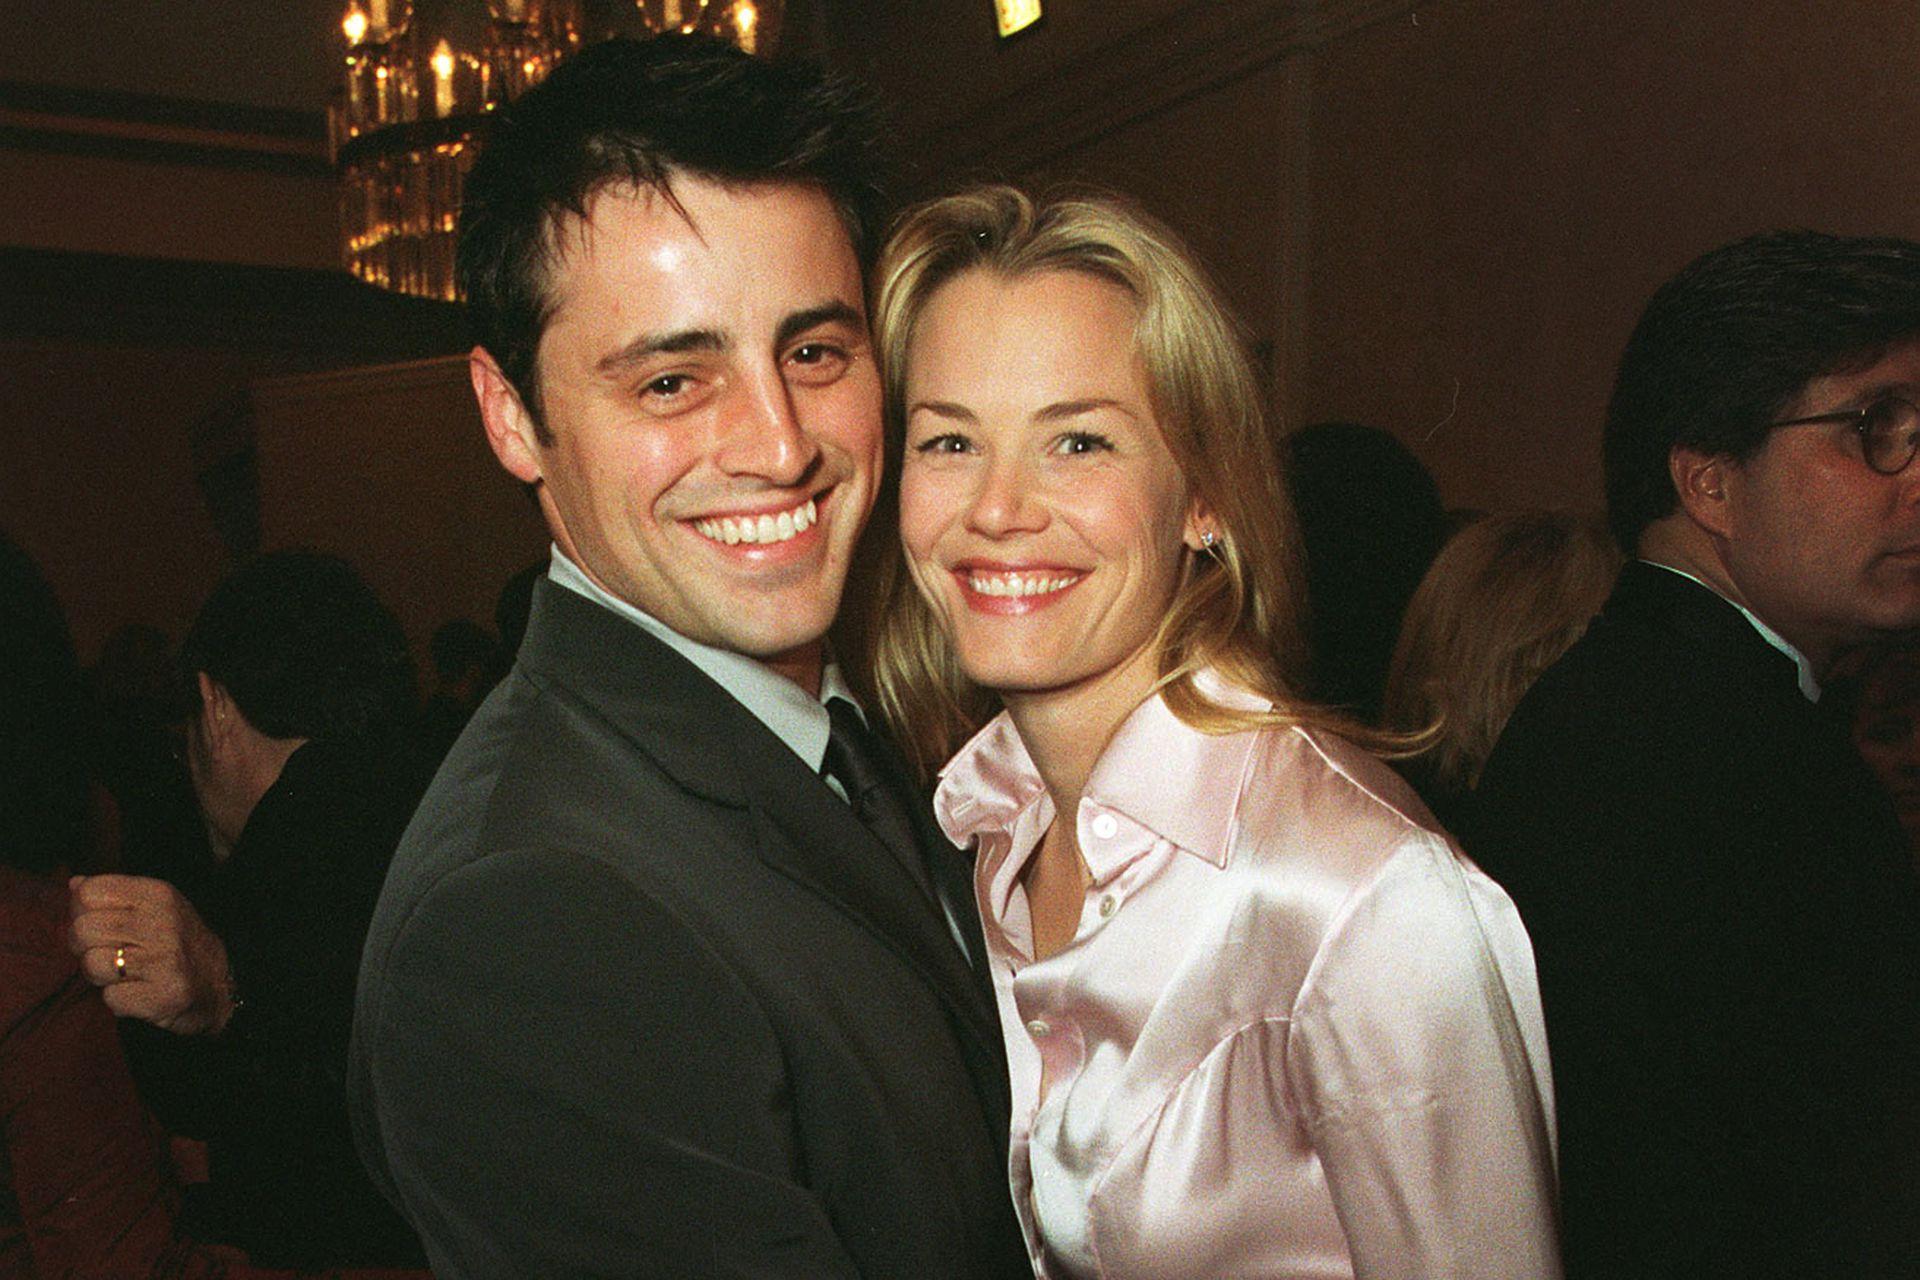 Matt Leblanc se comprometió con Melissa McKnight, luego de un año de noviazgo